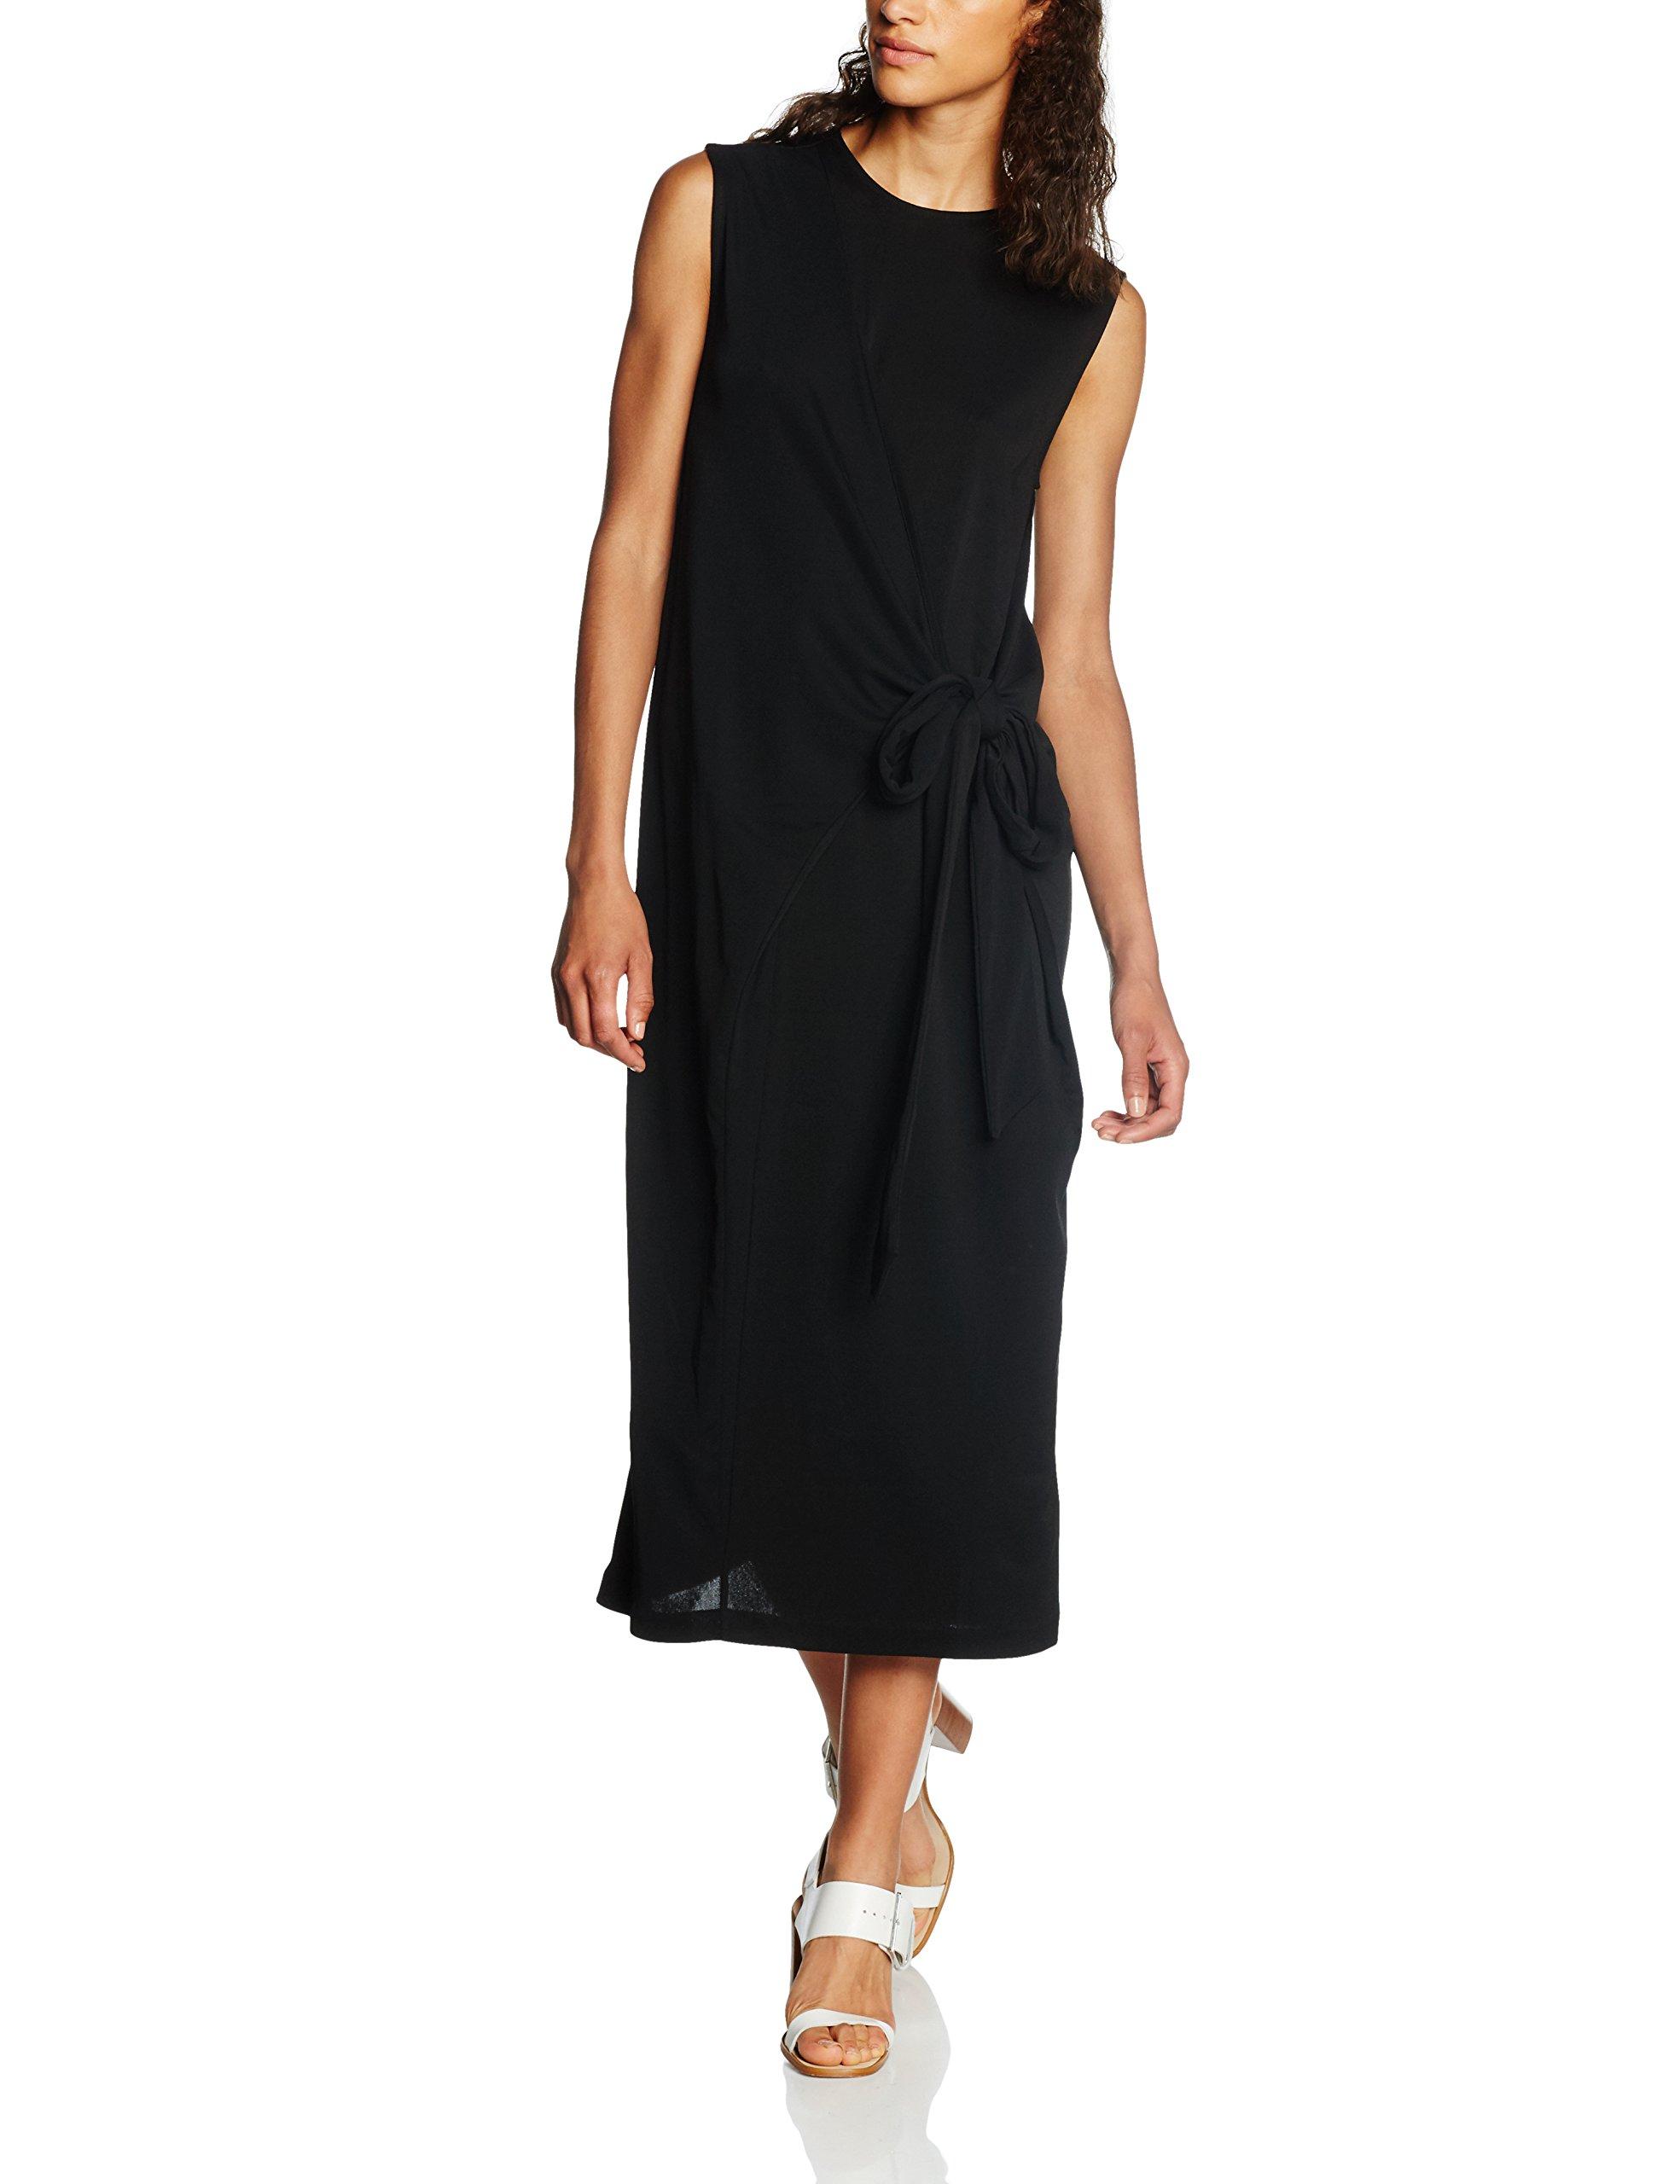 K smallFemme Fabricant Jersey x Filippa RobeNoirblack34taille Tie Dress qUzMVSp